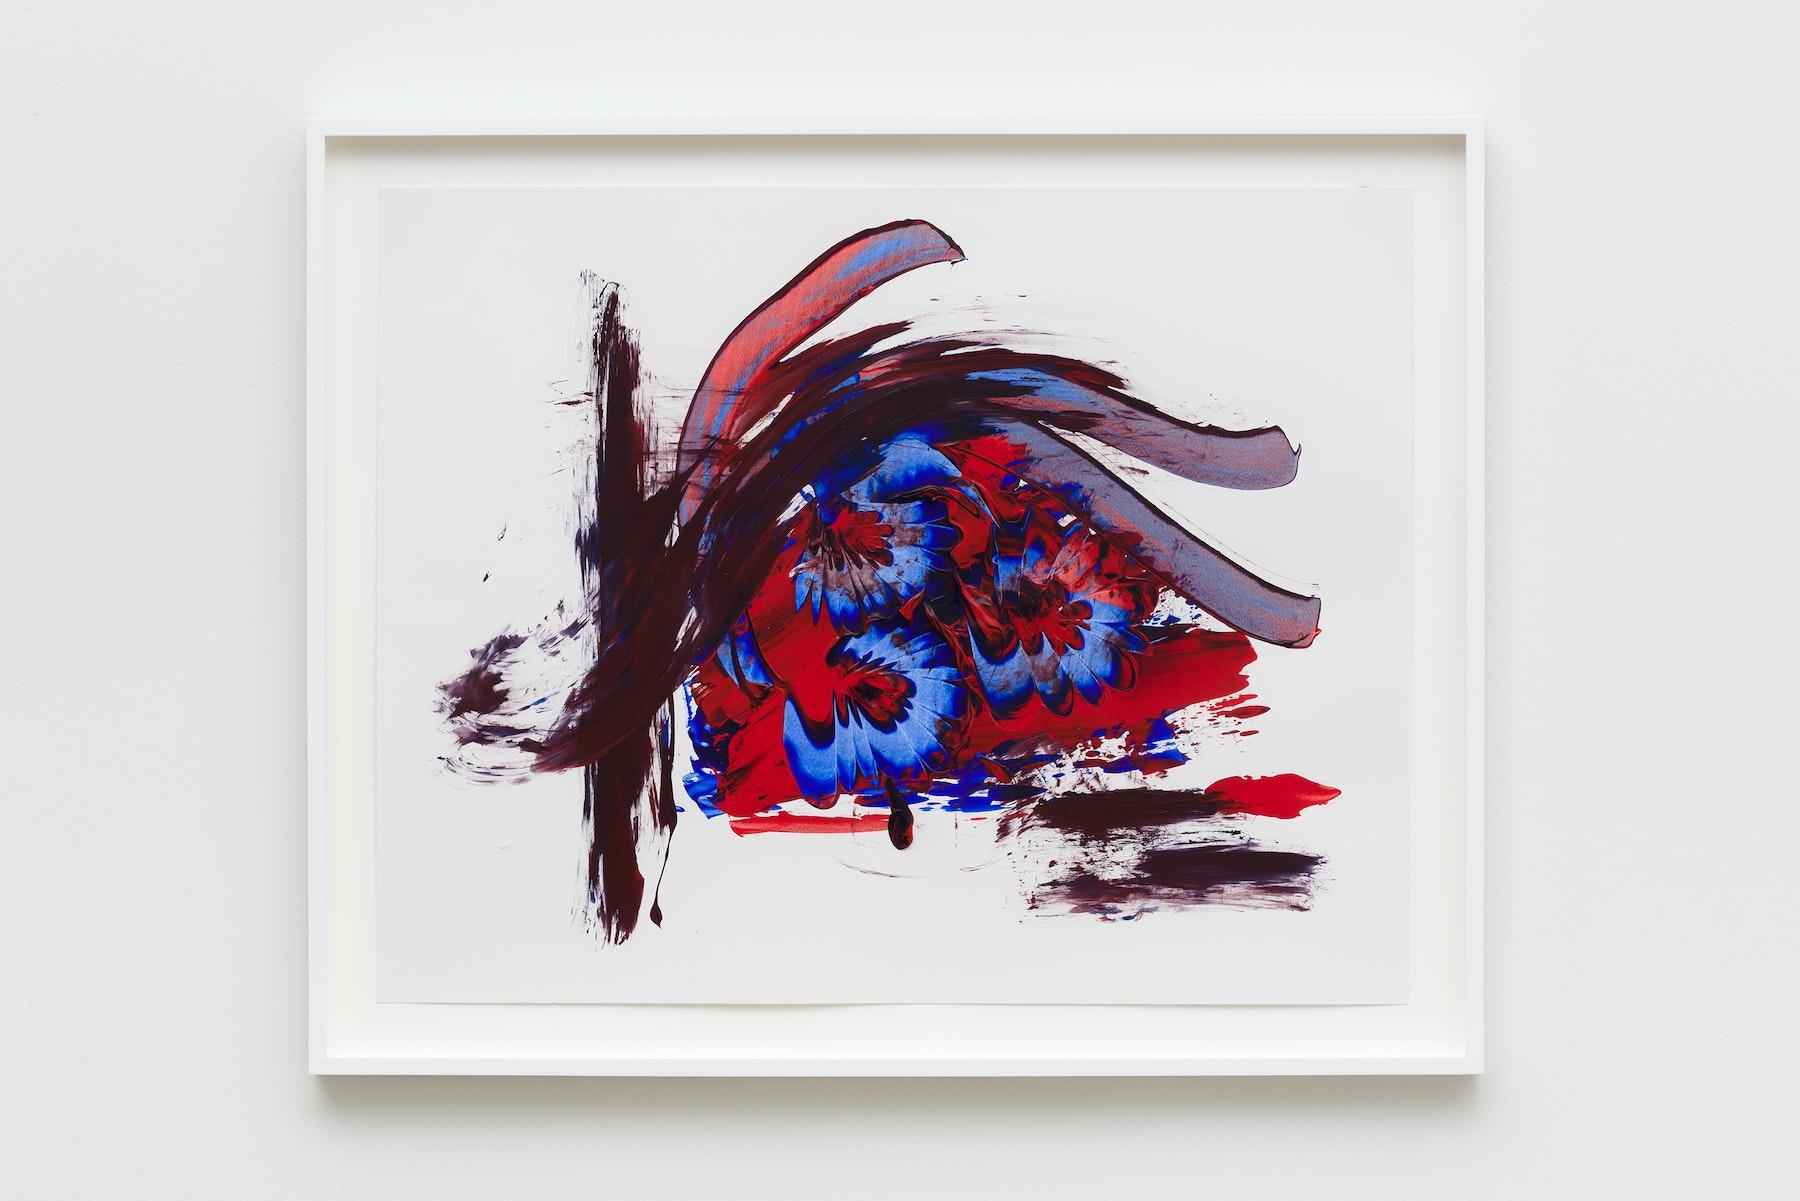 "Elizabeth Neel ""US 21,"" 2019 Acrylic on paper 22.5 x 28.5"" [HxW] (57.15 x 72.39 cm) Inventory #NEE247 Courtesy of the artist and Vielmetter Los Angeles Photo credit: Jeff McLane"